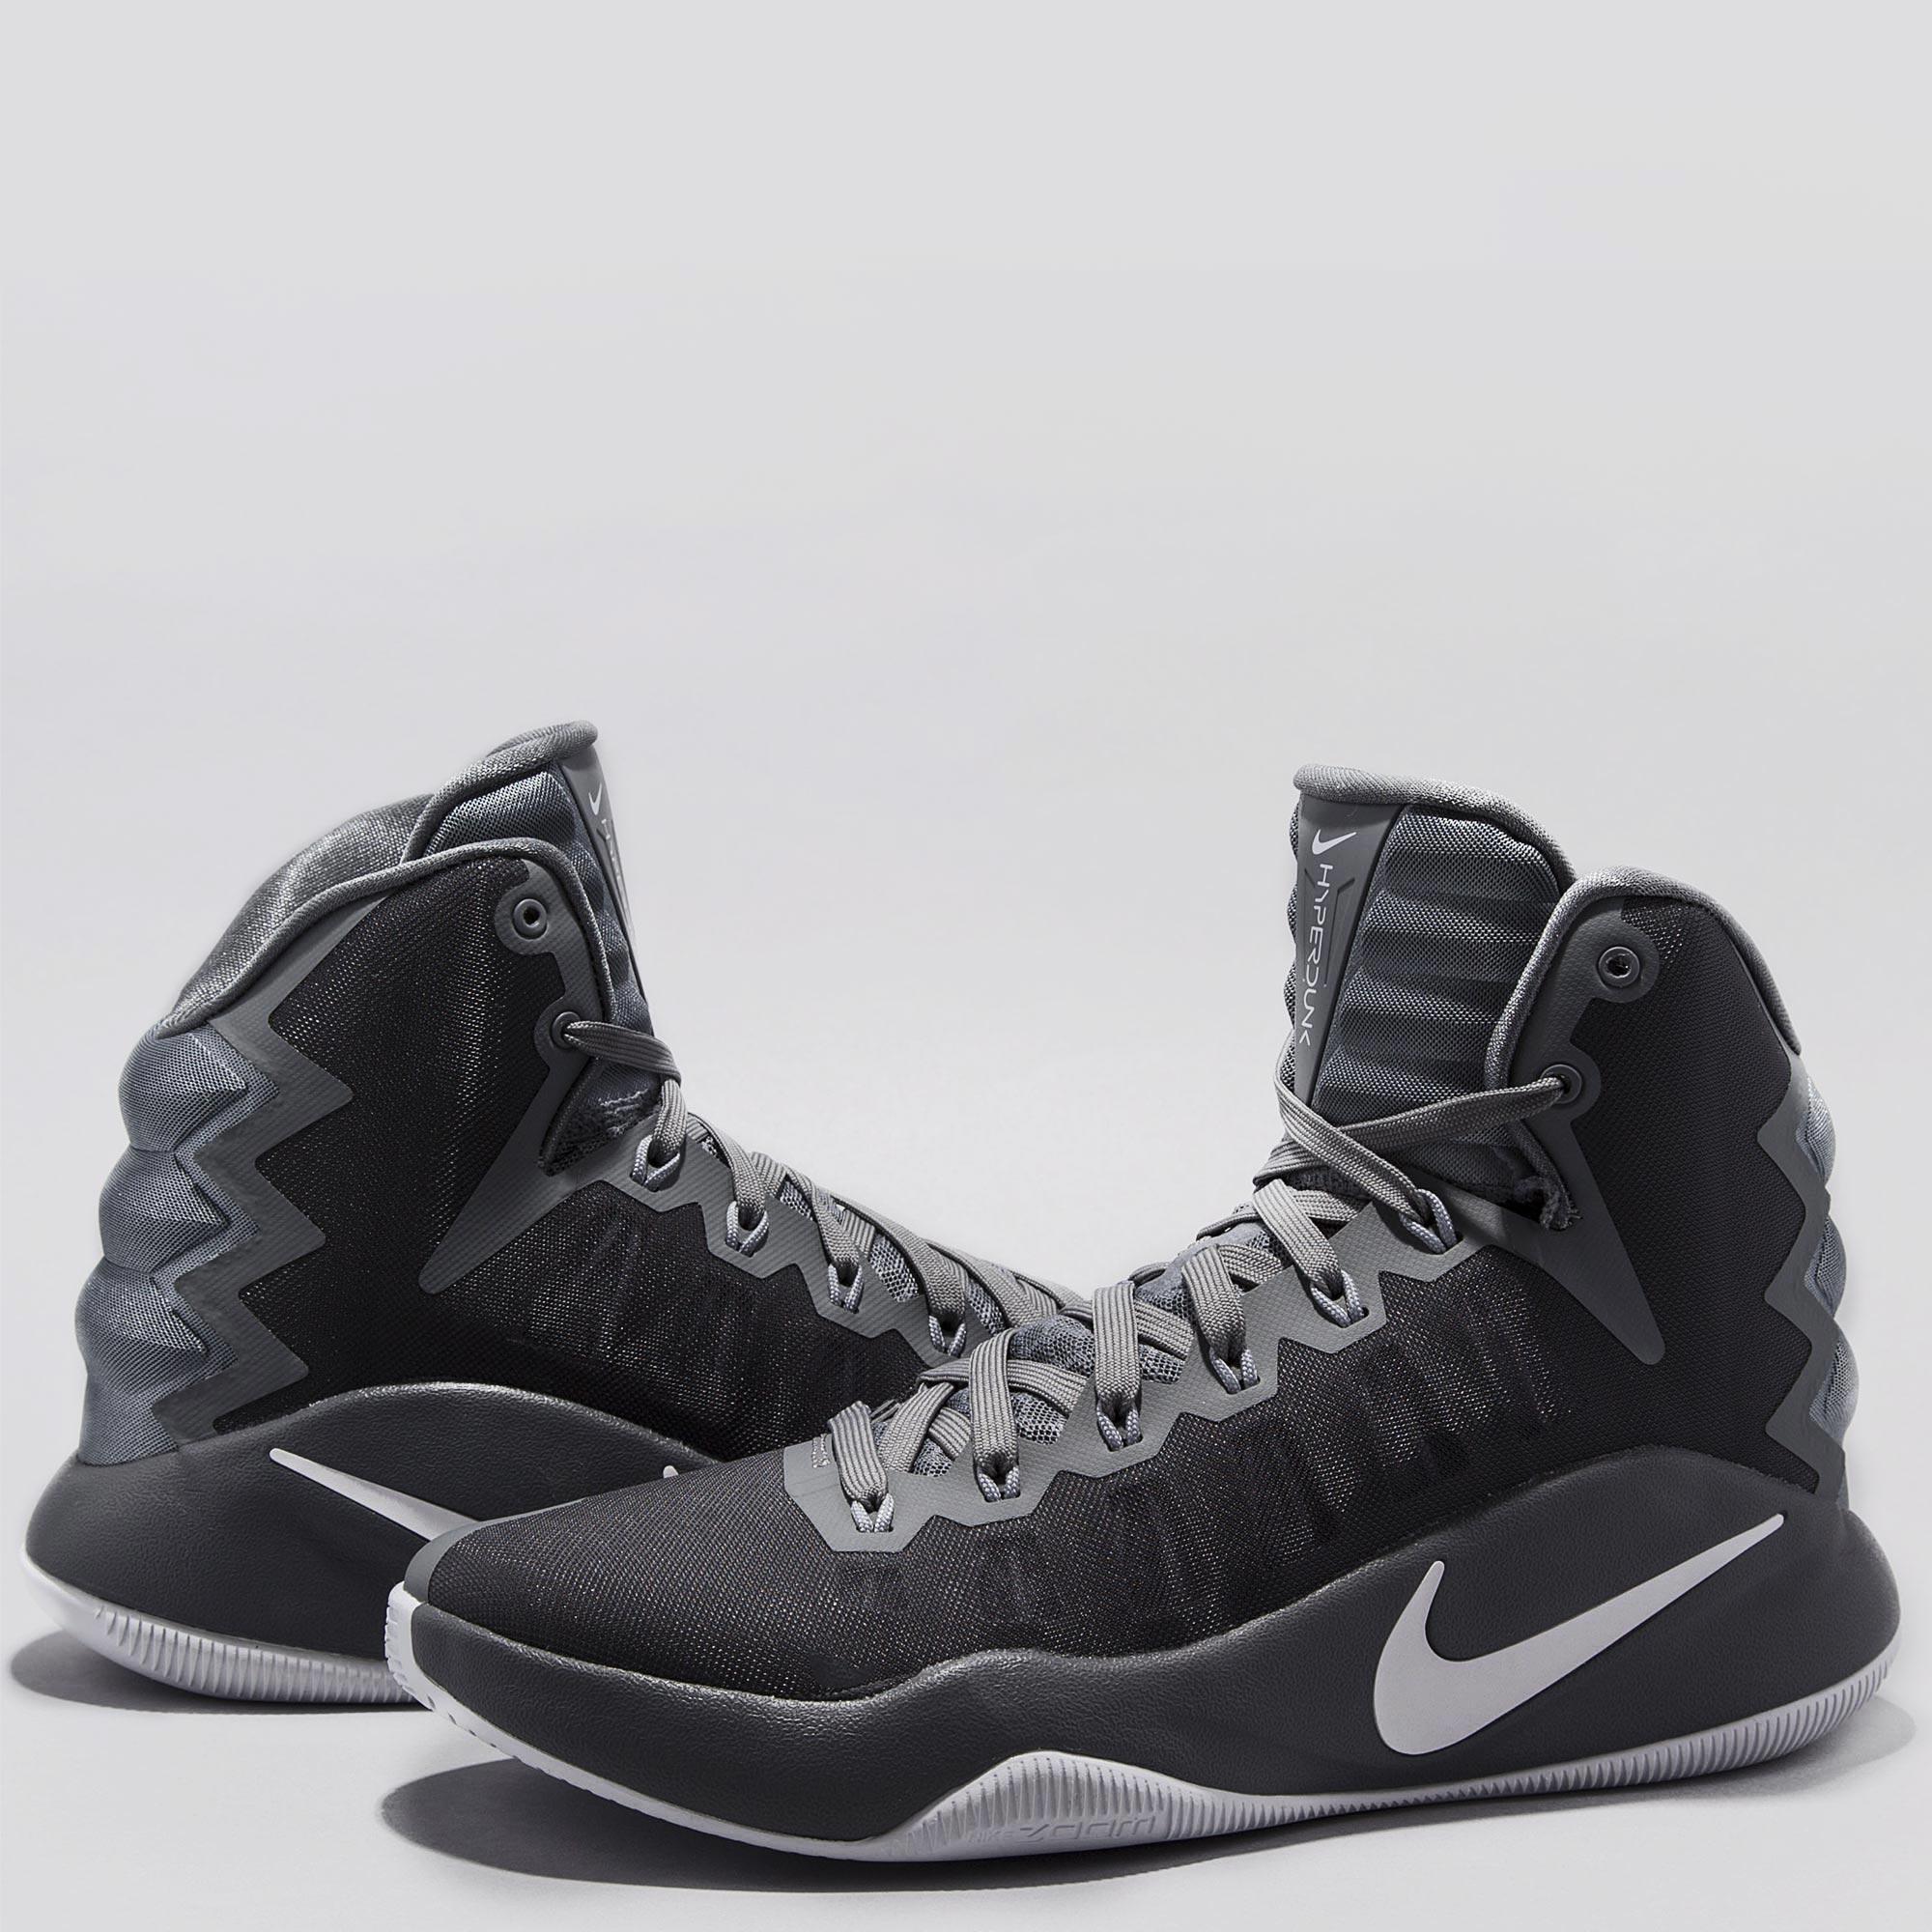 Nike Hyperdunk 2016 Basketball Shoe - Cool Grey/White